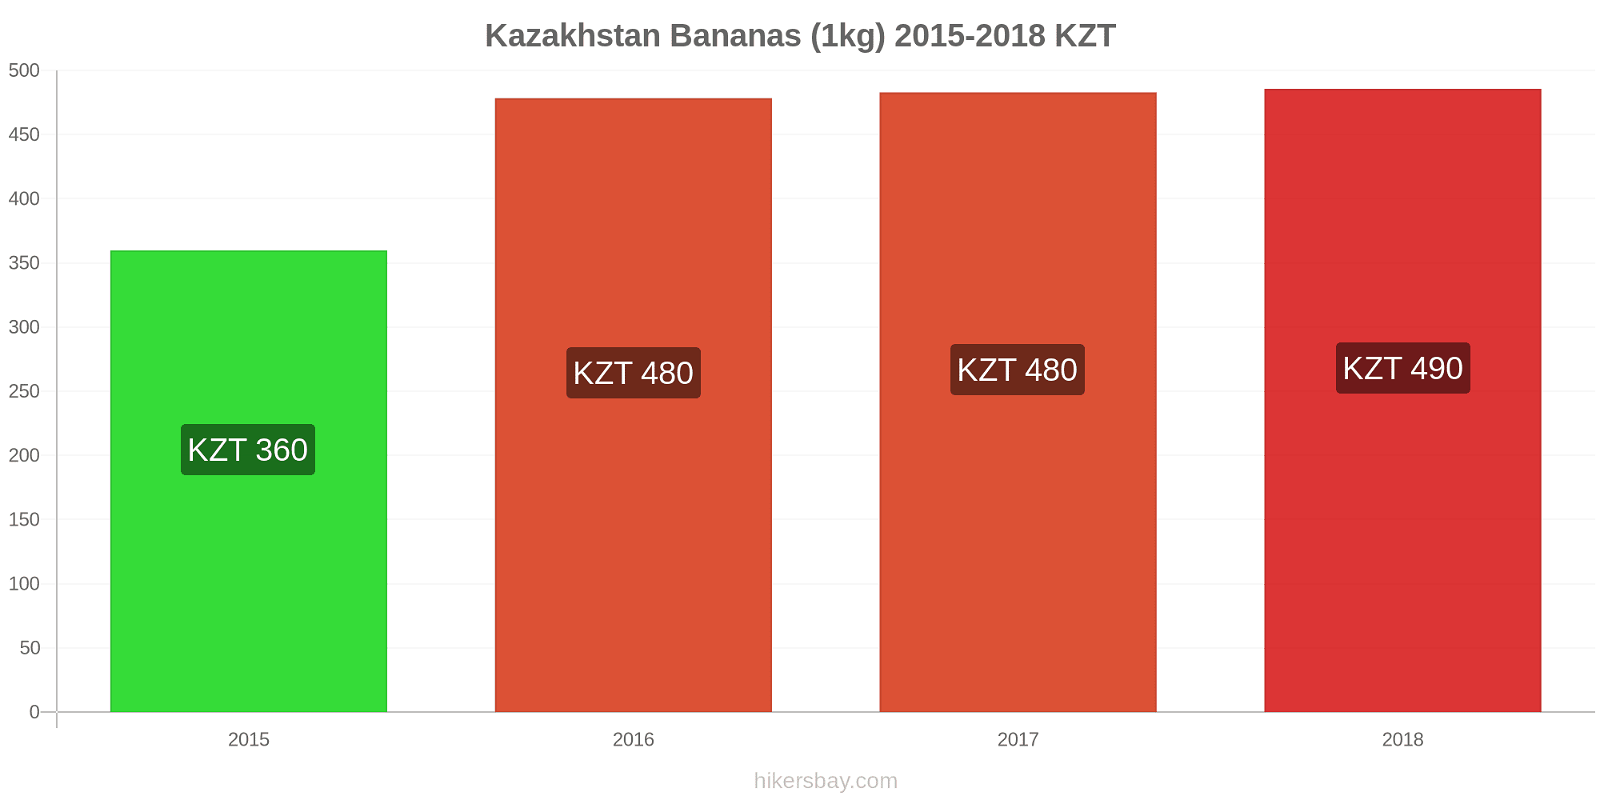 Kazakhstan price changes Bananas (1kg) hikersbay.com